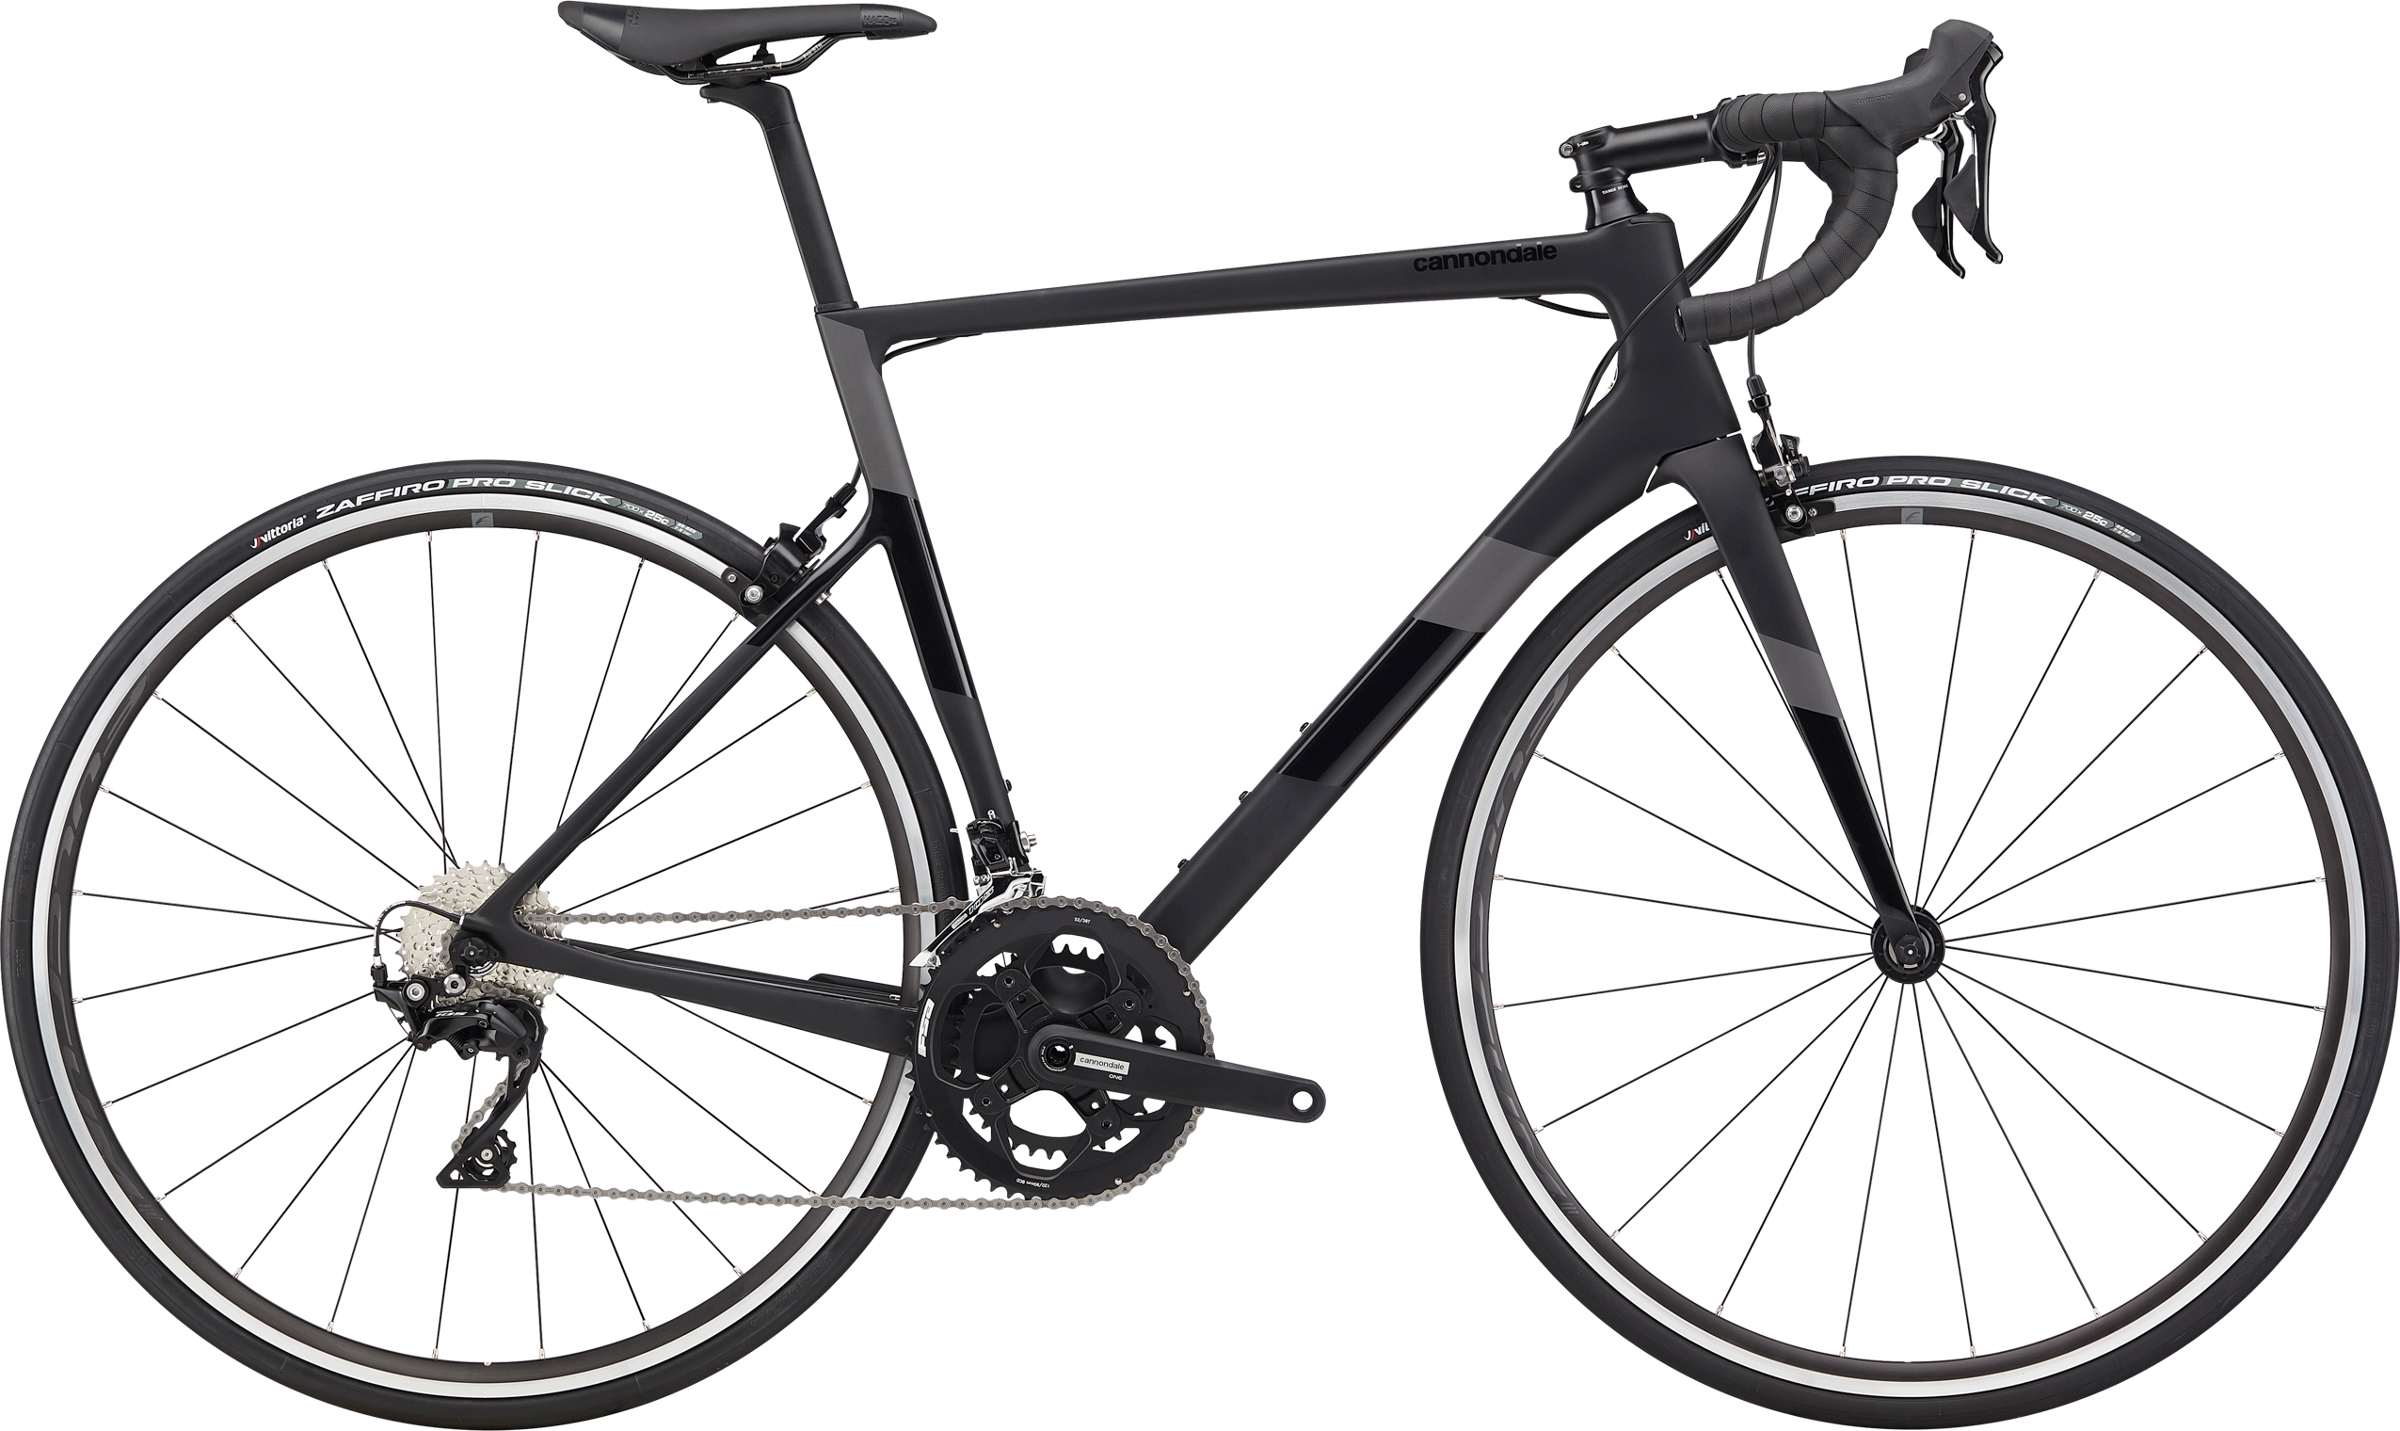 Cannondale Super Six Evo Carbon 105 Road Bike 2020 BBQ Black